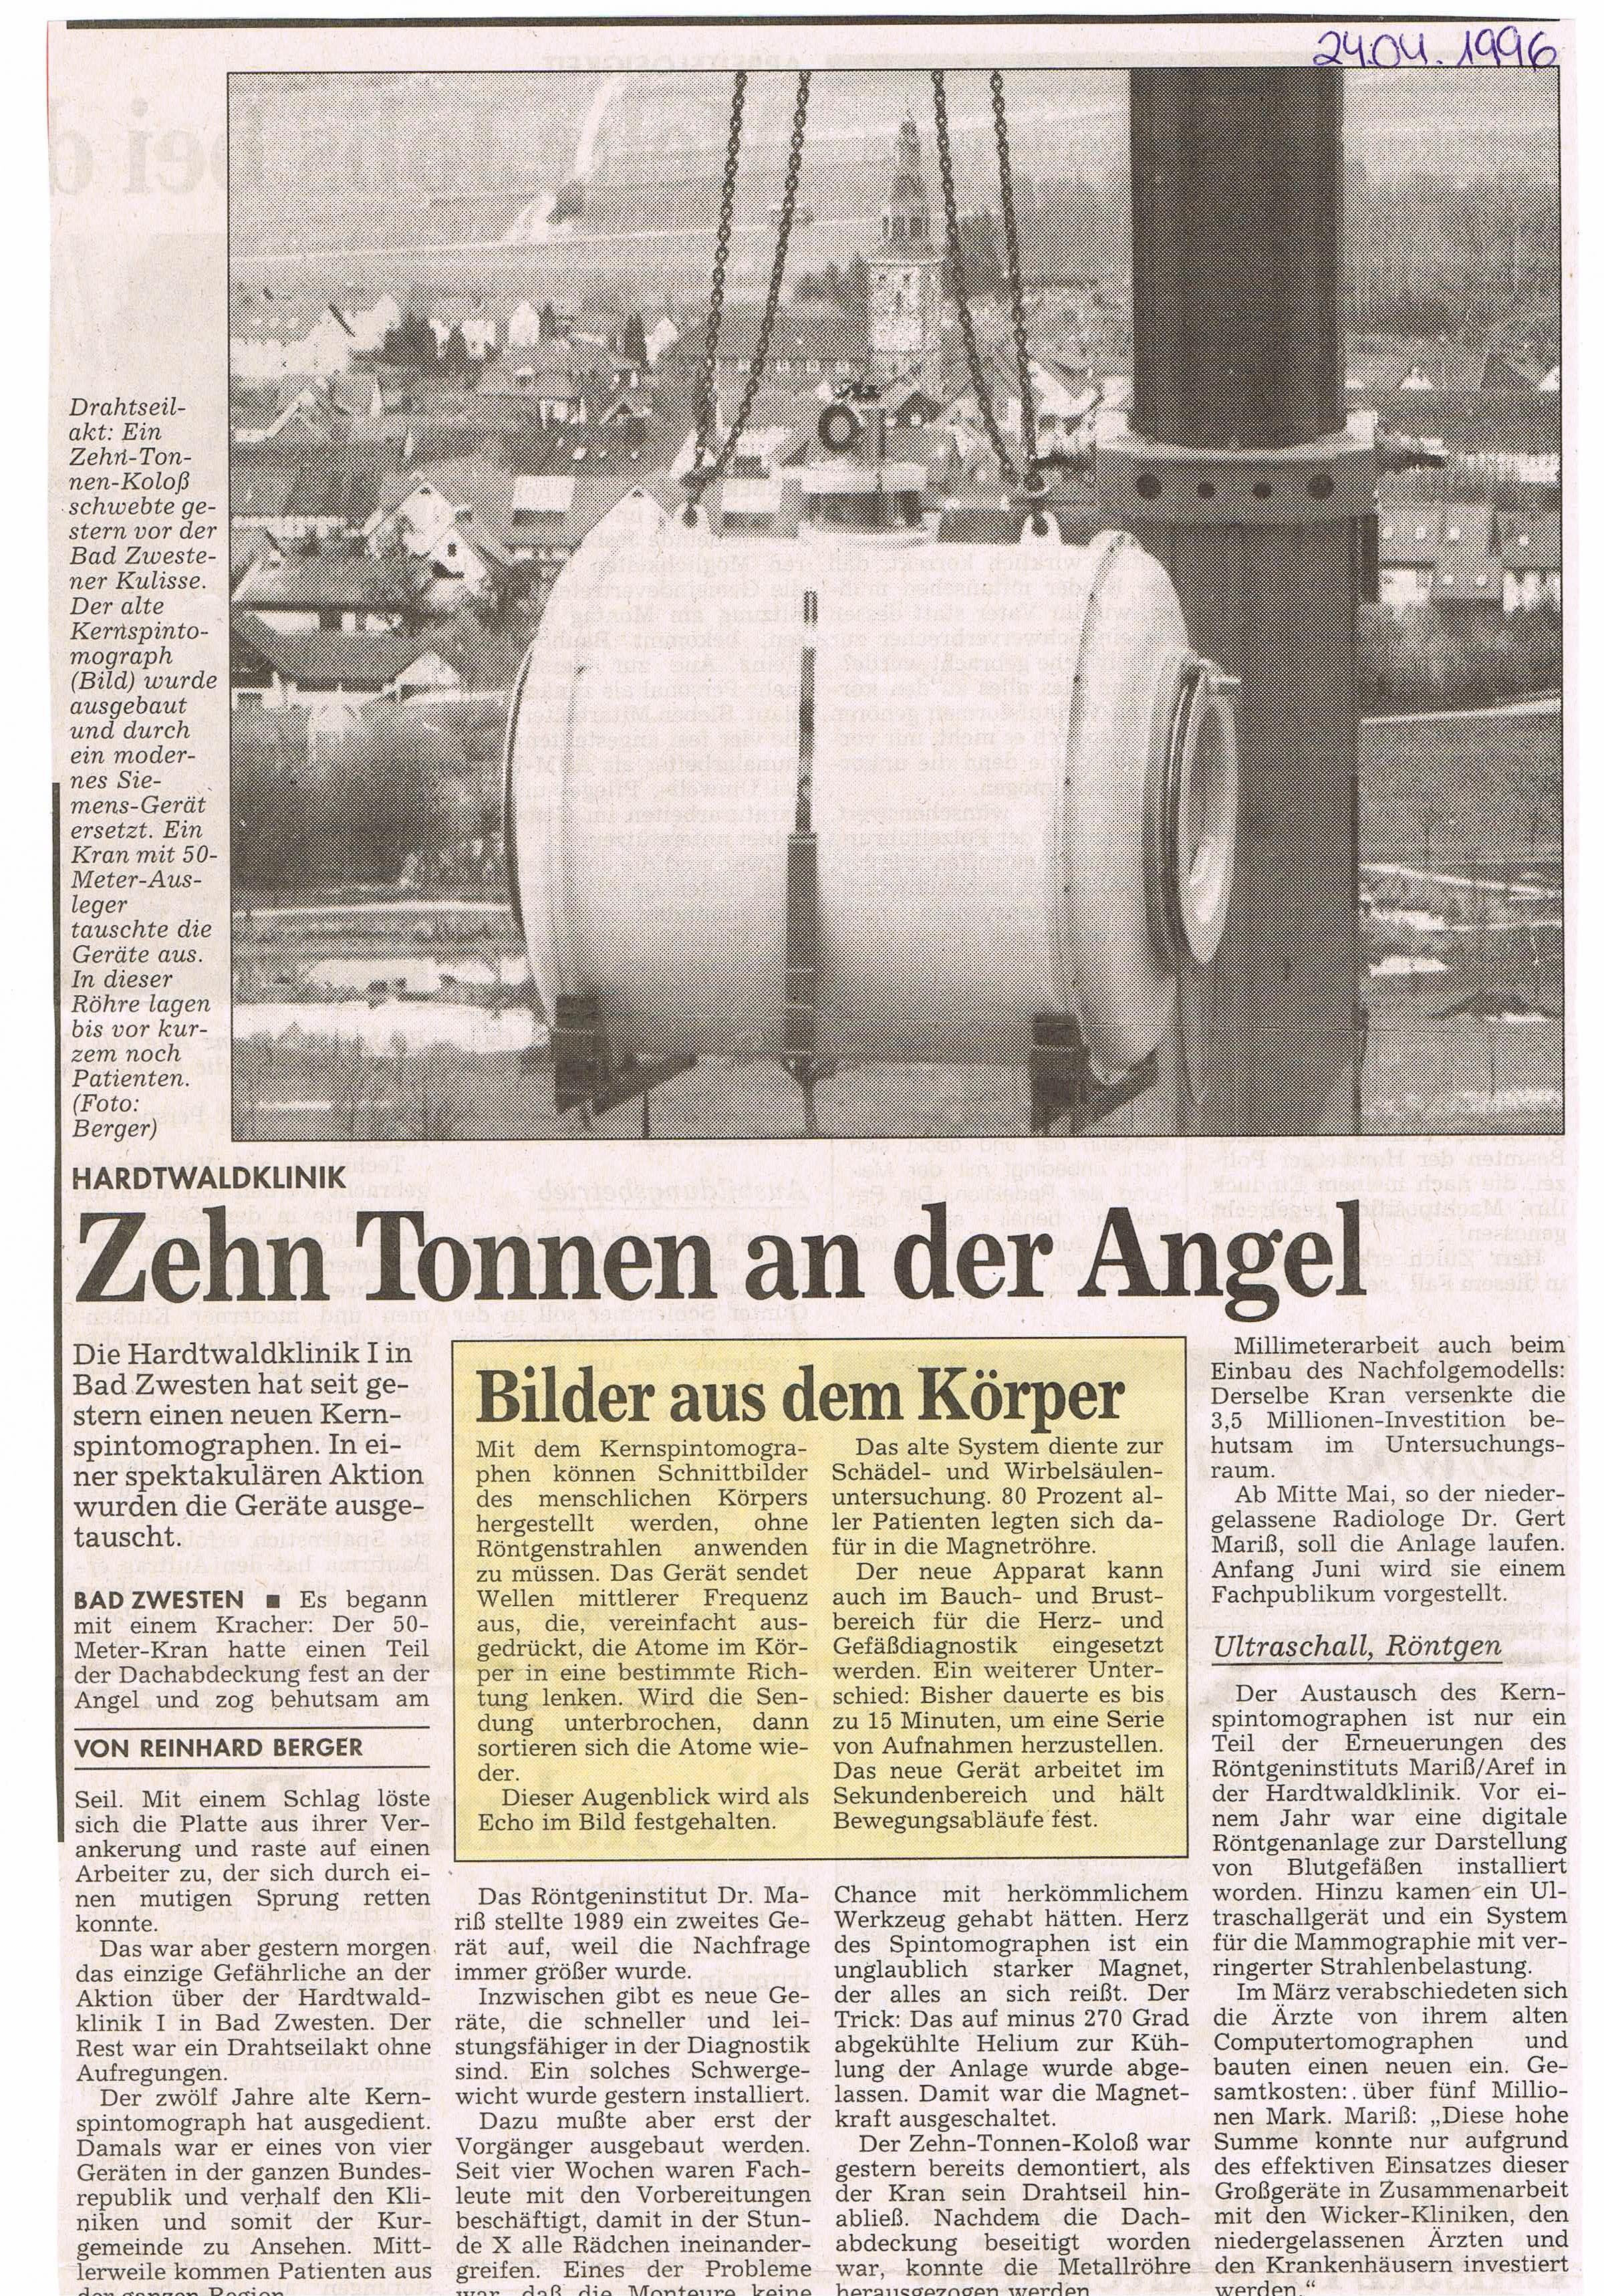 Kernspin-Röhre kam per Luftfracht | Radiologie Nordhessen